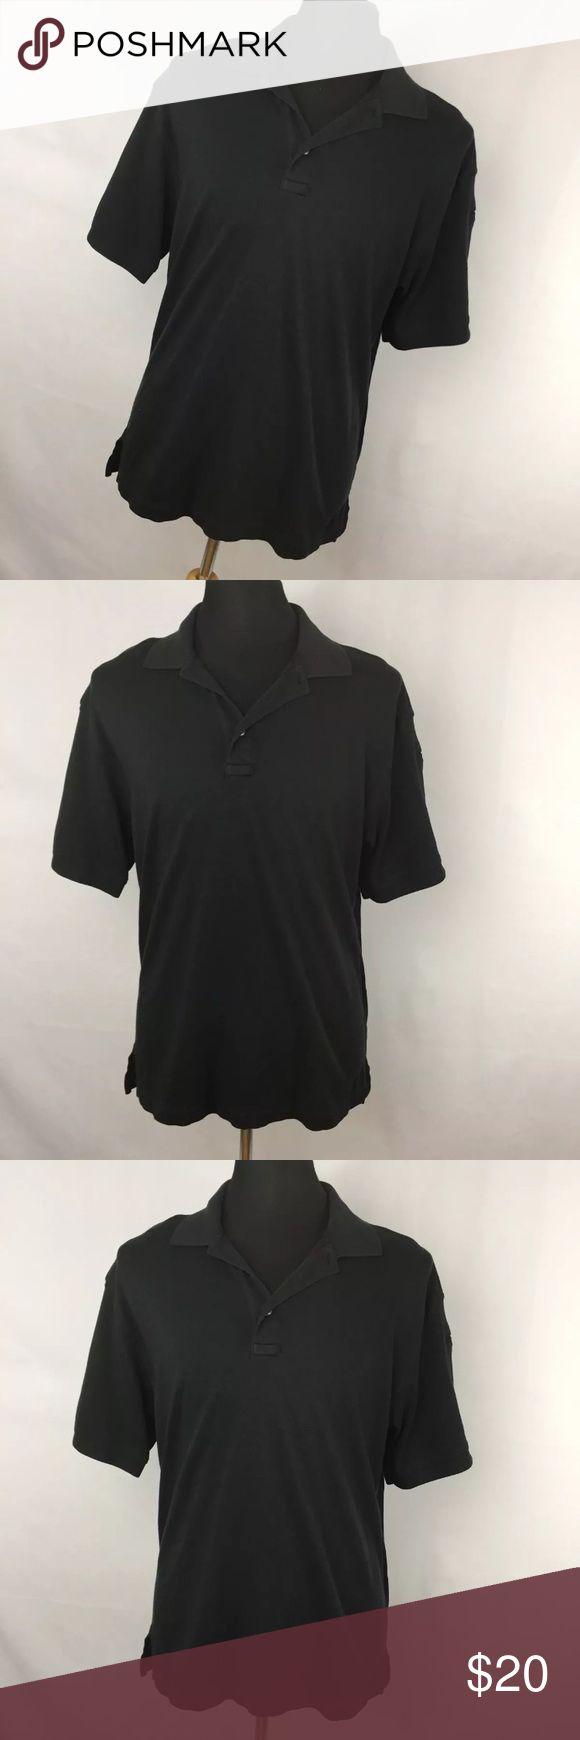 "5.11 Tactical Series L Polo Shirt Black Short Slv 5.11 Tactical Series L Large Polo Shirt Black Short Sleeve Pocket Classic. Excellent condition. Smoke free home.  Chest measurement - 48"" Length measurement - 30"" 5.11 Tactical Shirts Polos"